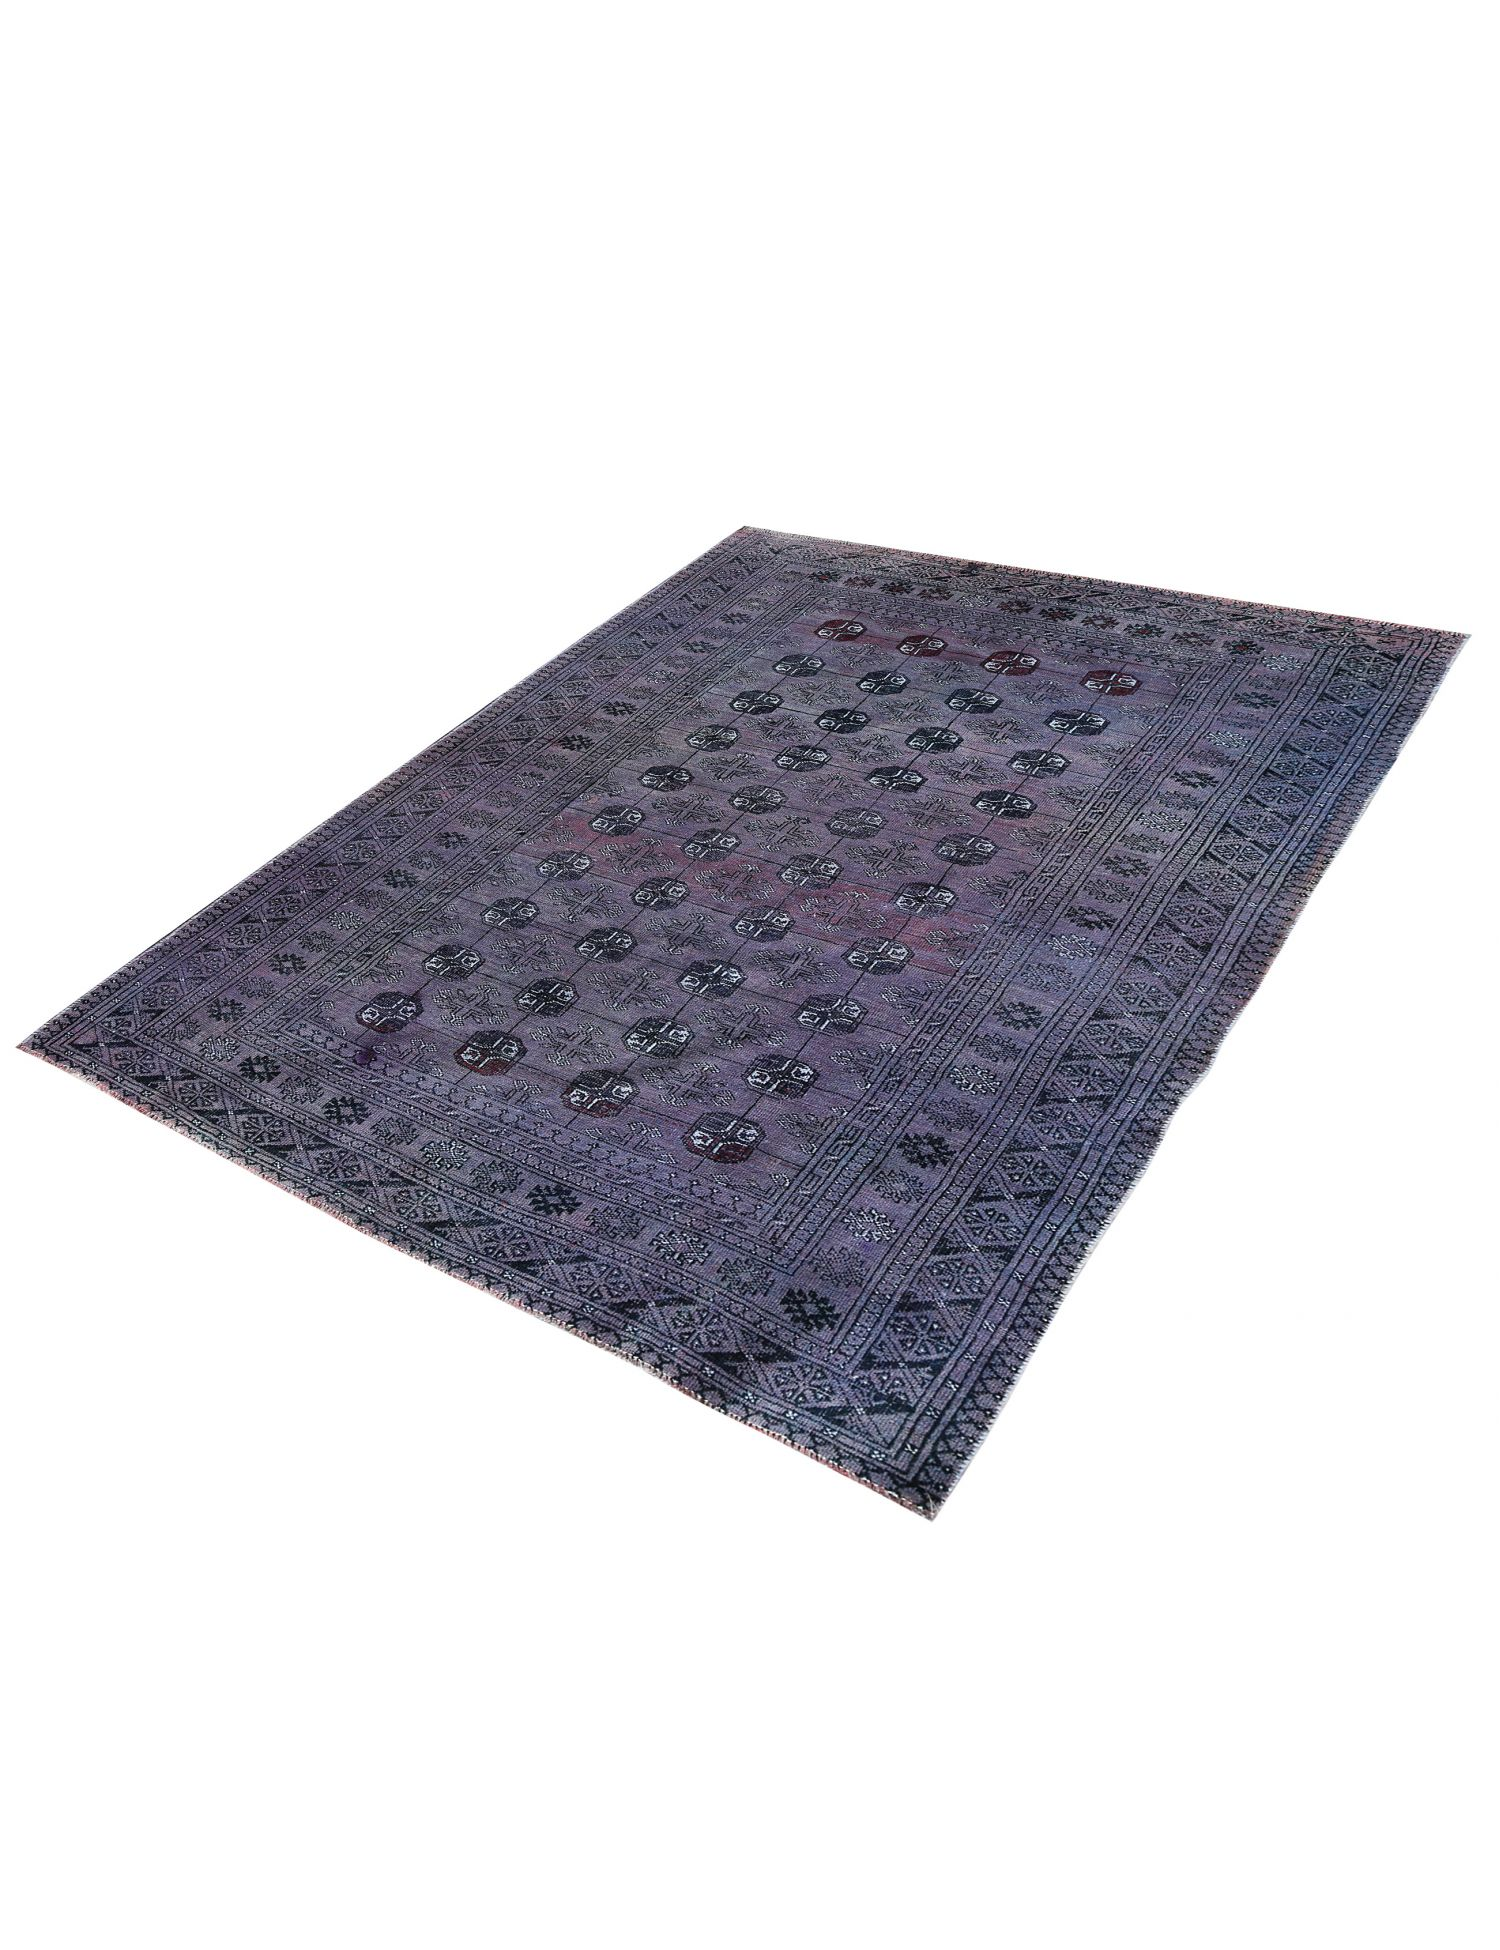 Vintage Teppich  lila <br/>275 x 206 cm